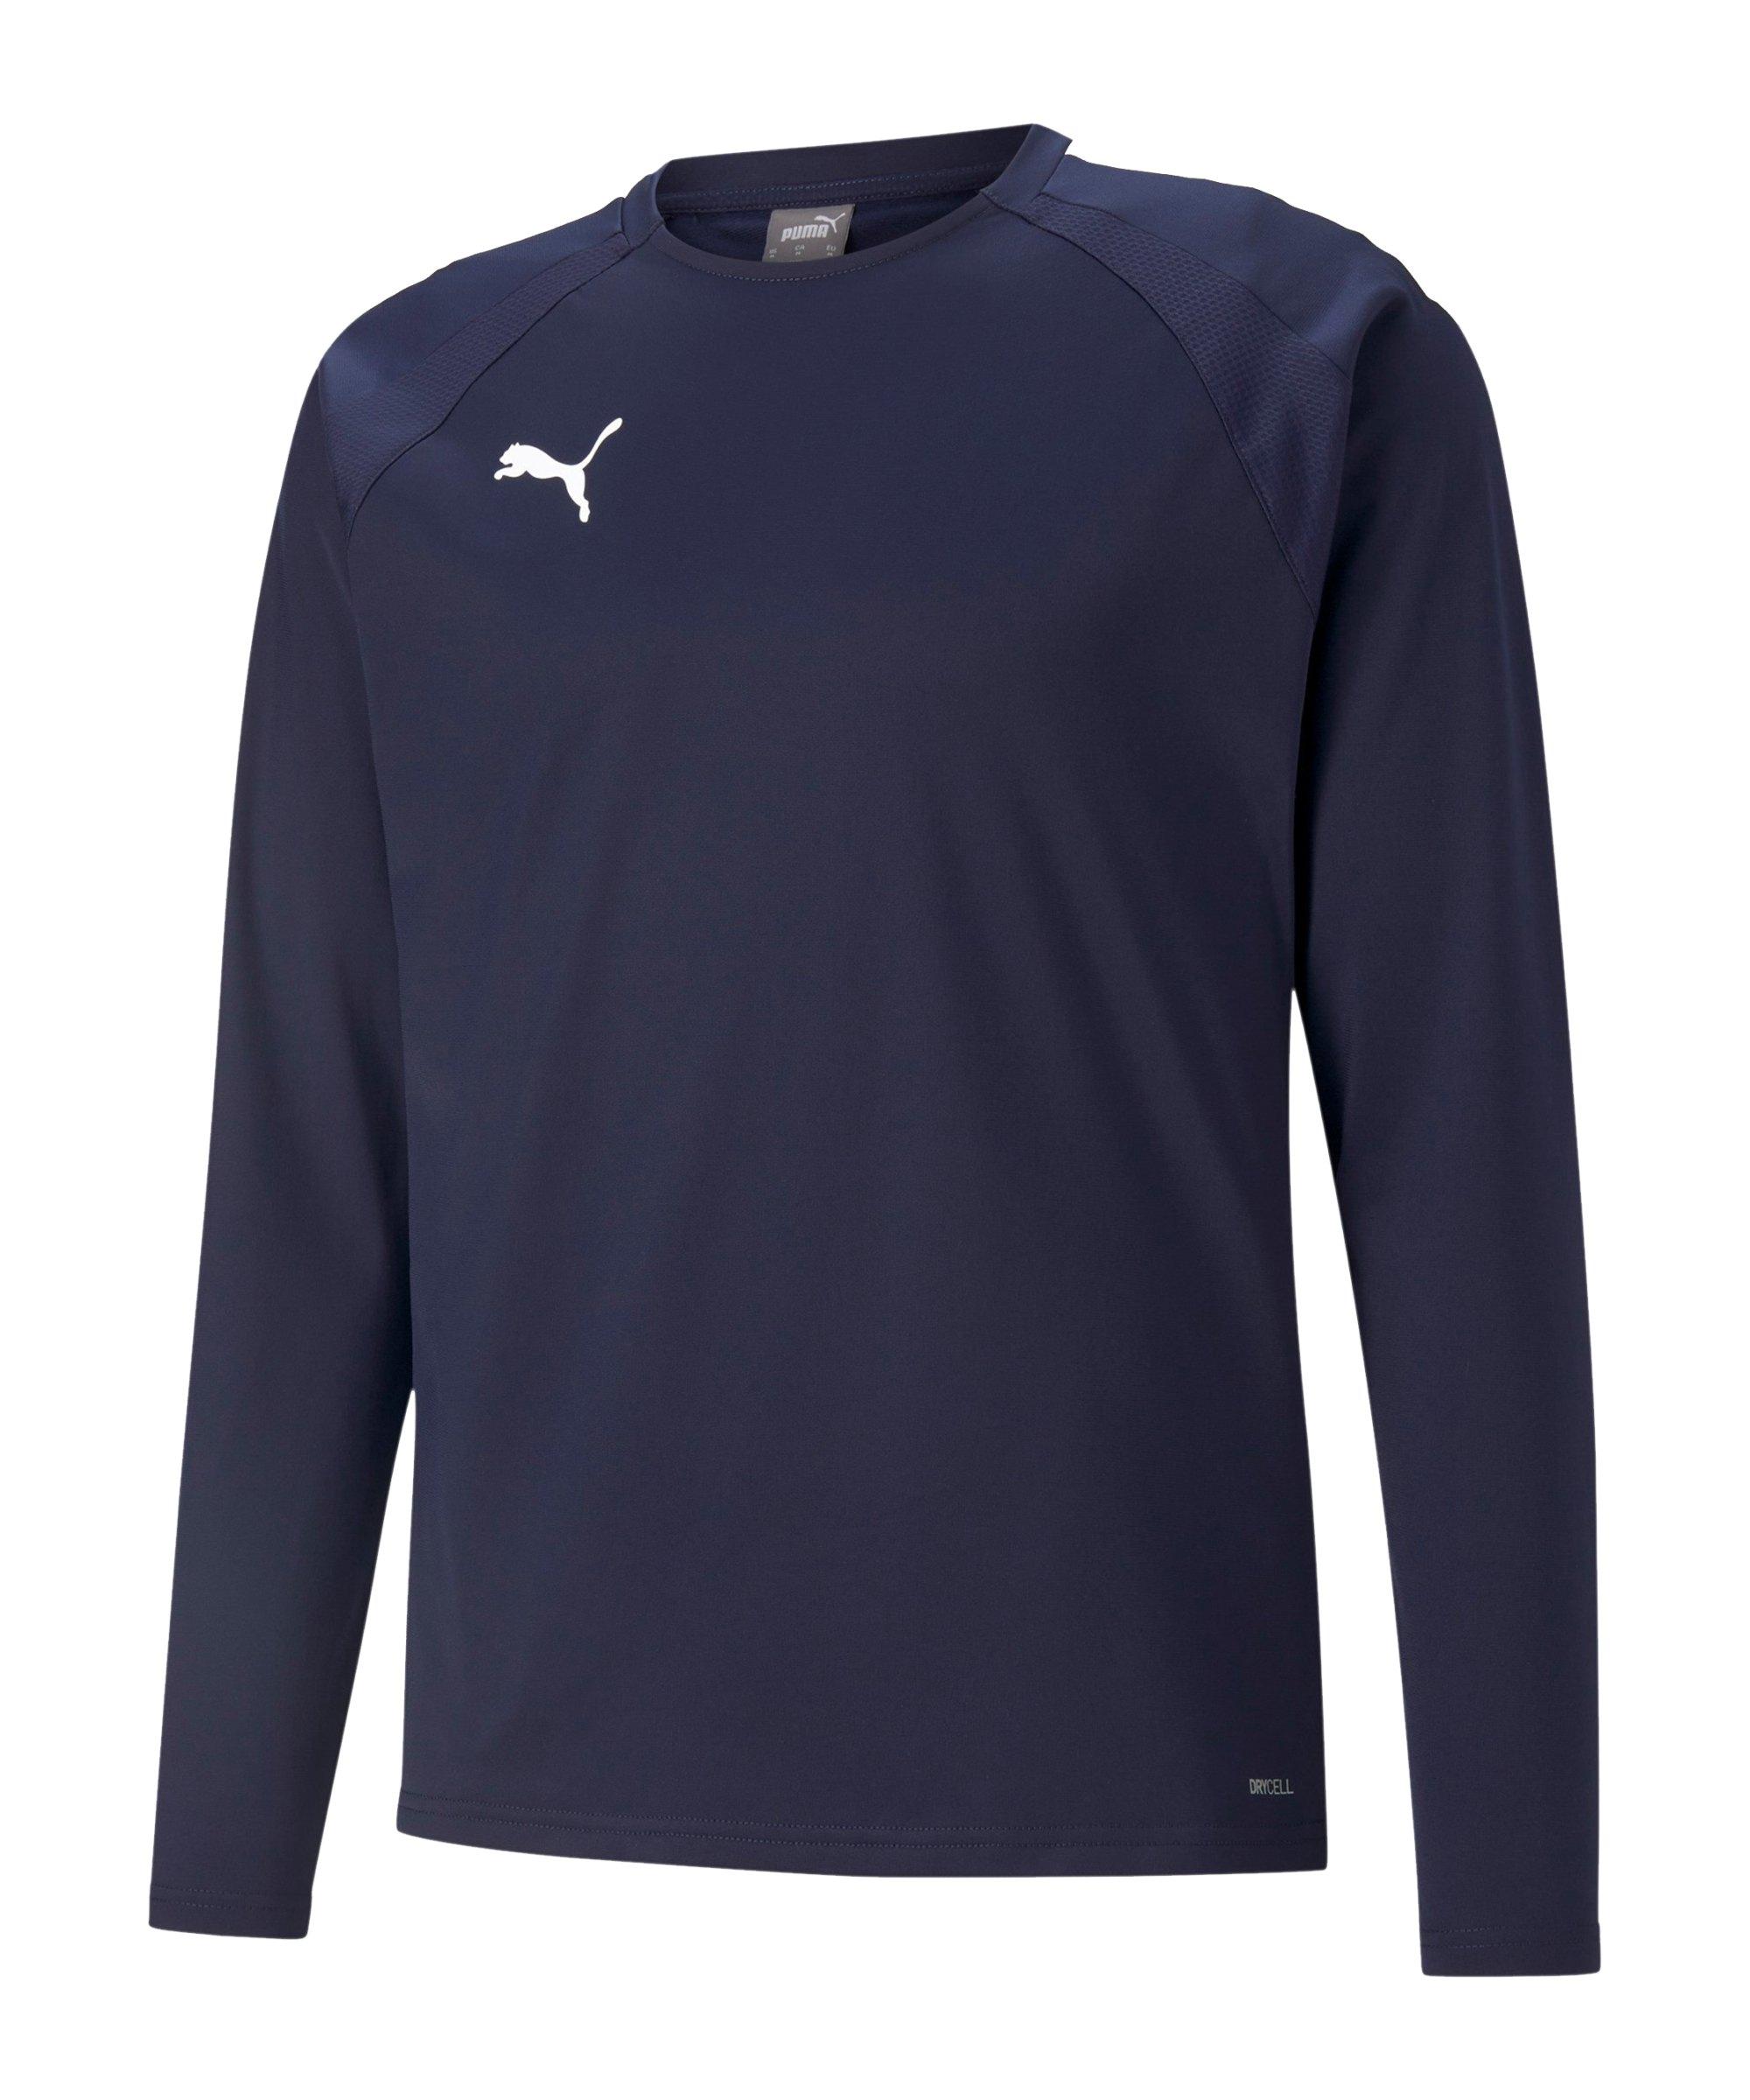 PUMA TeamLIGA Trainig Sweatshirt Blau F06 - blau